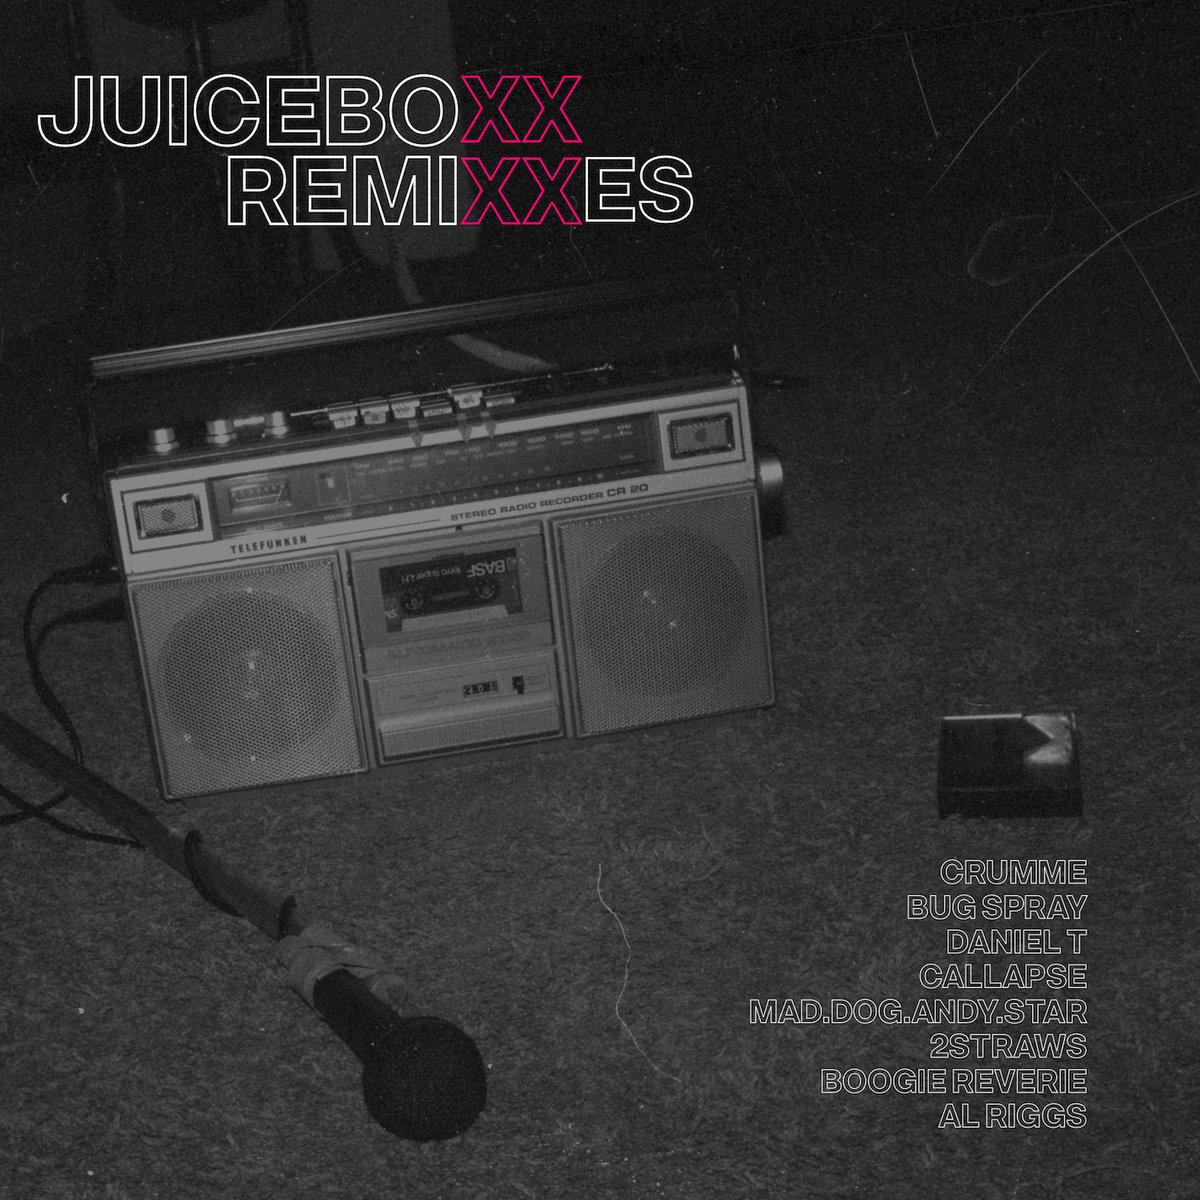 Juiceboxx Remixes | The Love Language